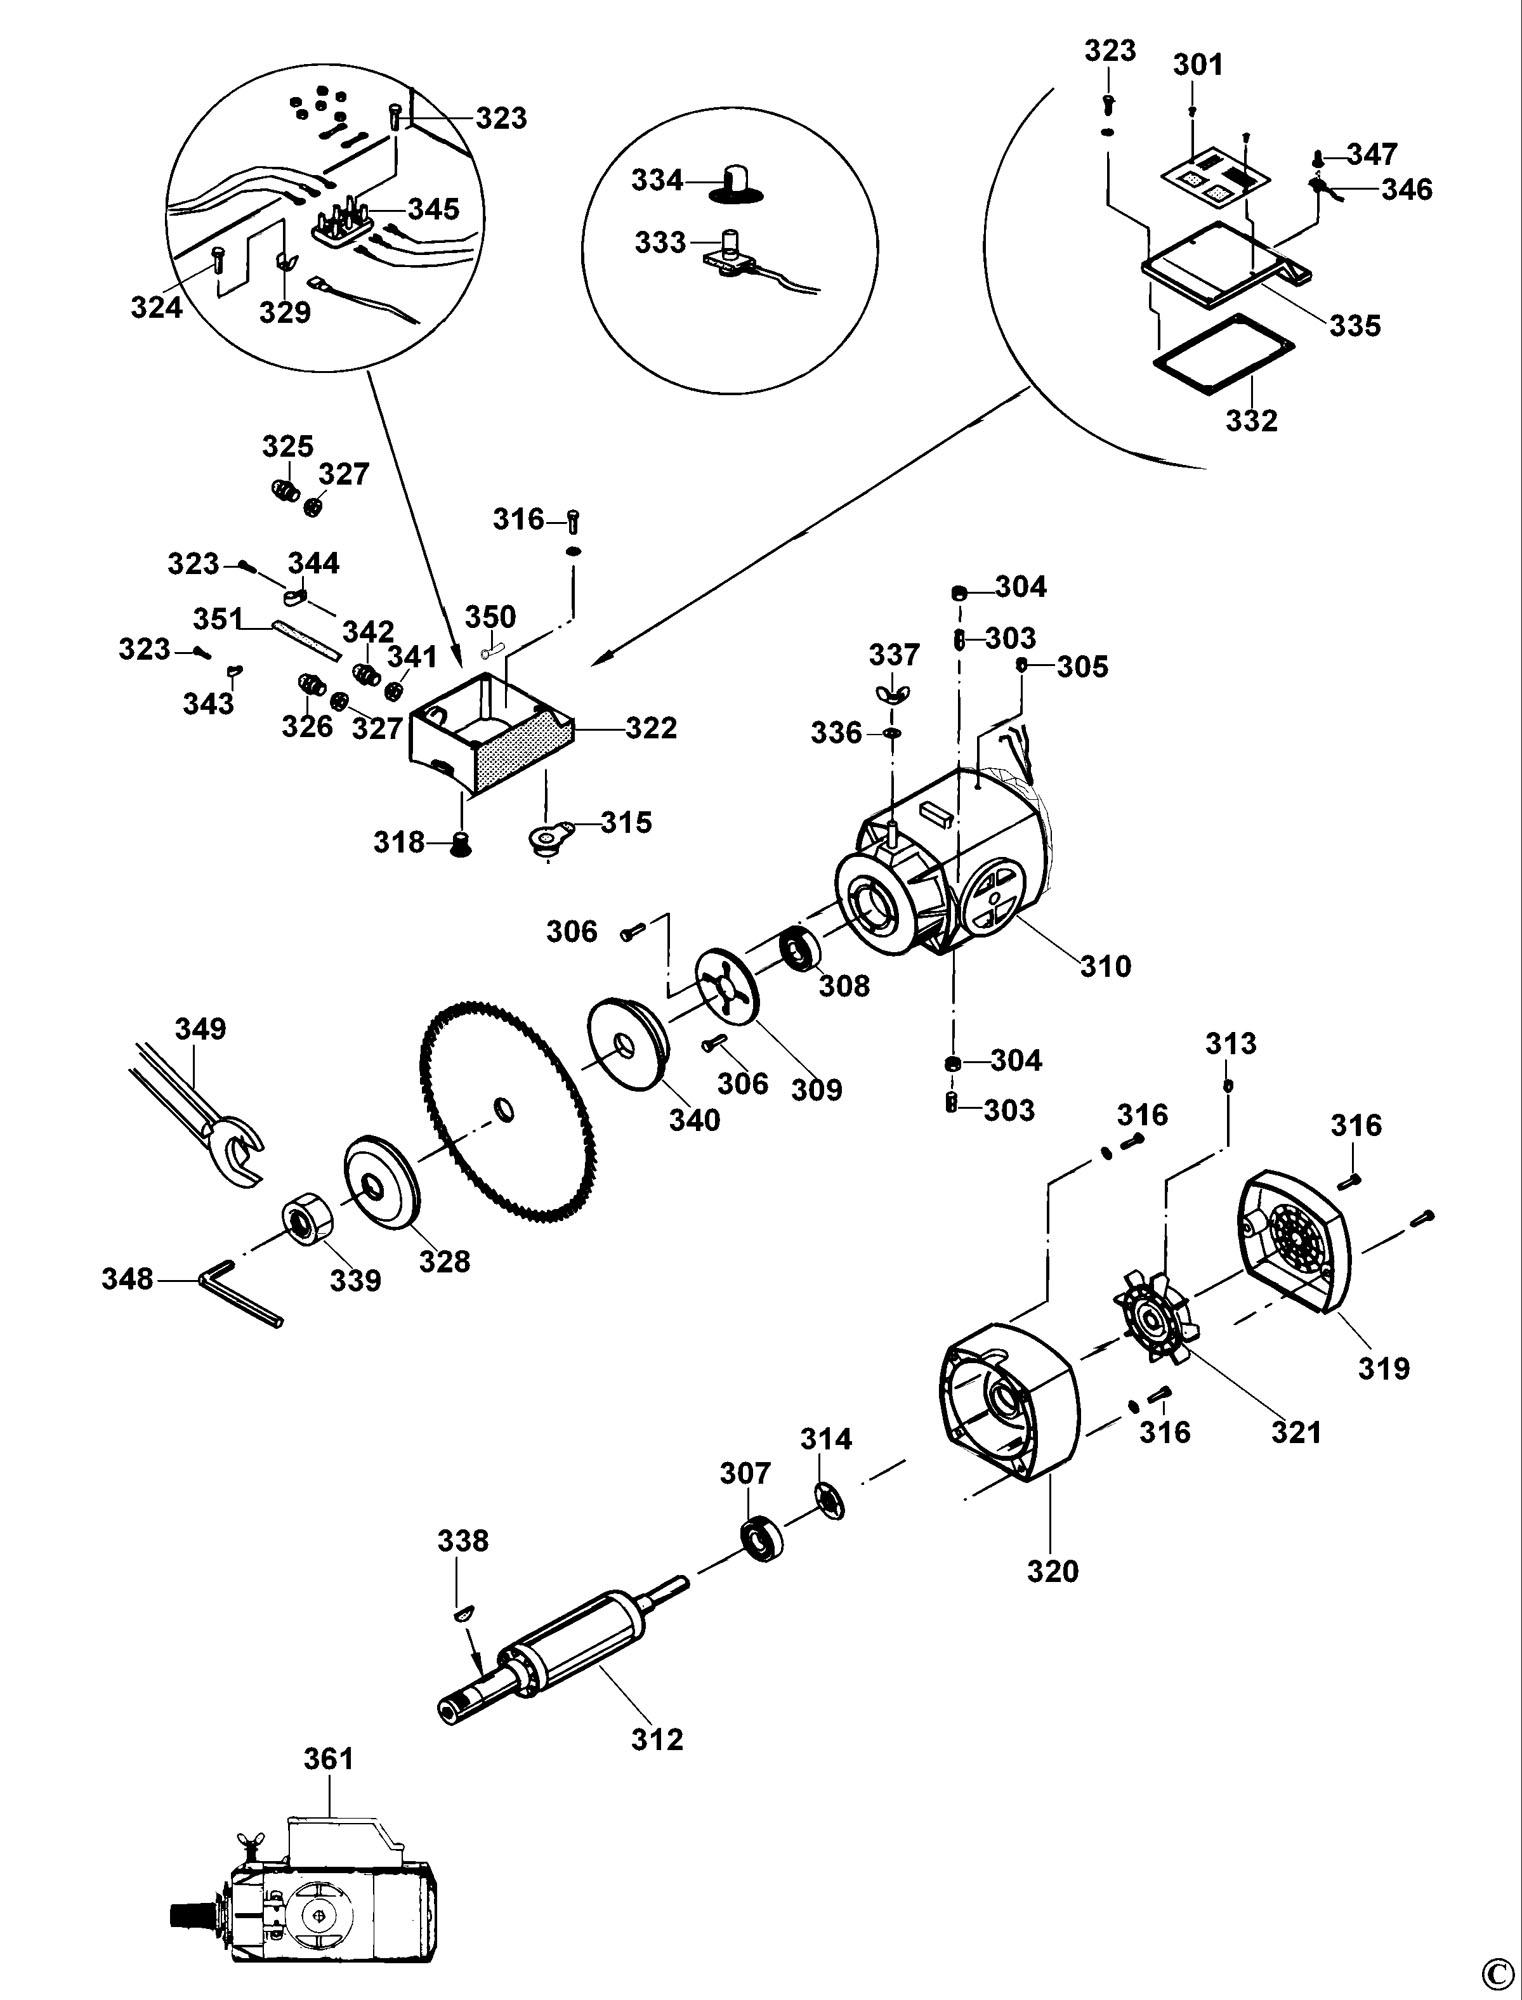 spares for dewalt dw729 radial arm saw  type 1  spare